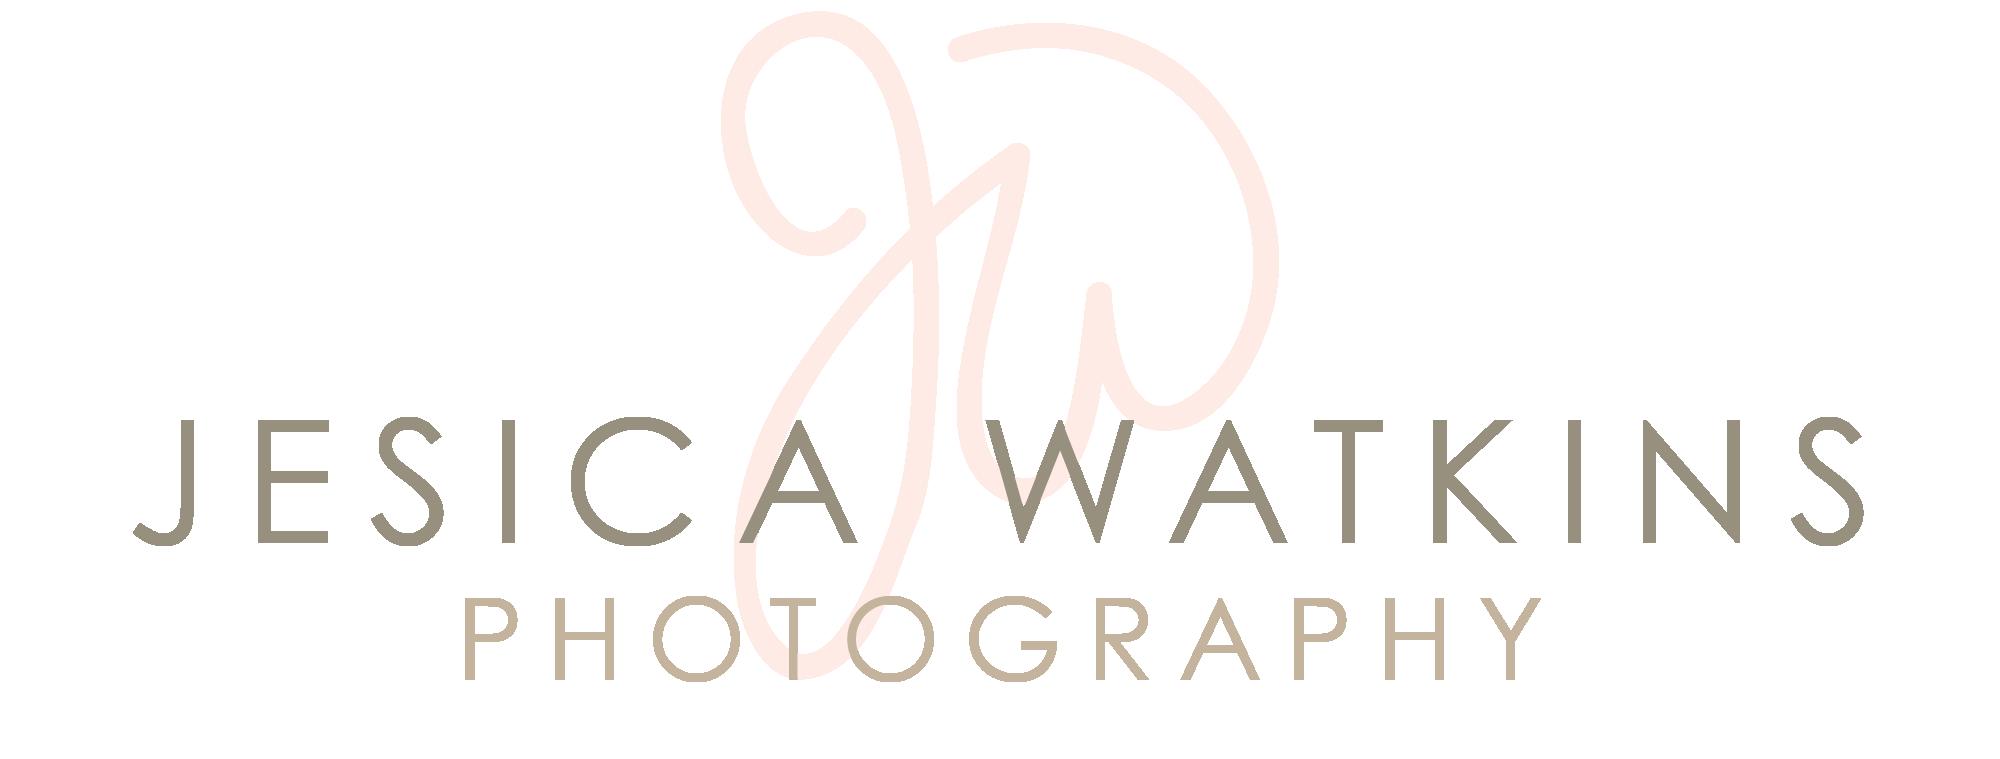 Jesica Watkins Photography